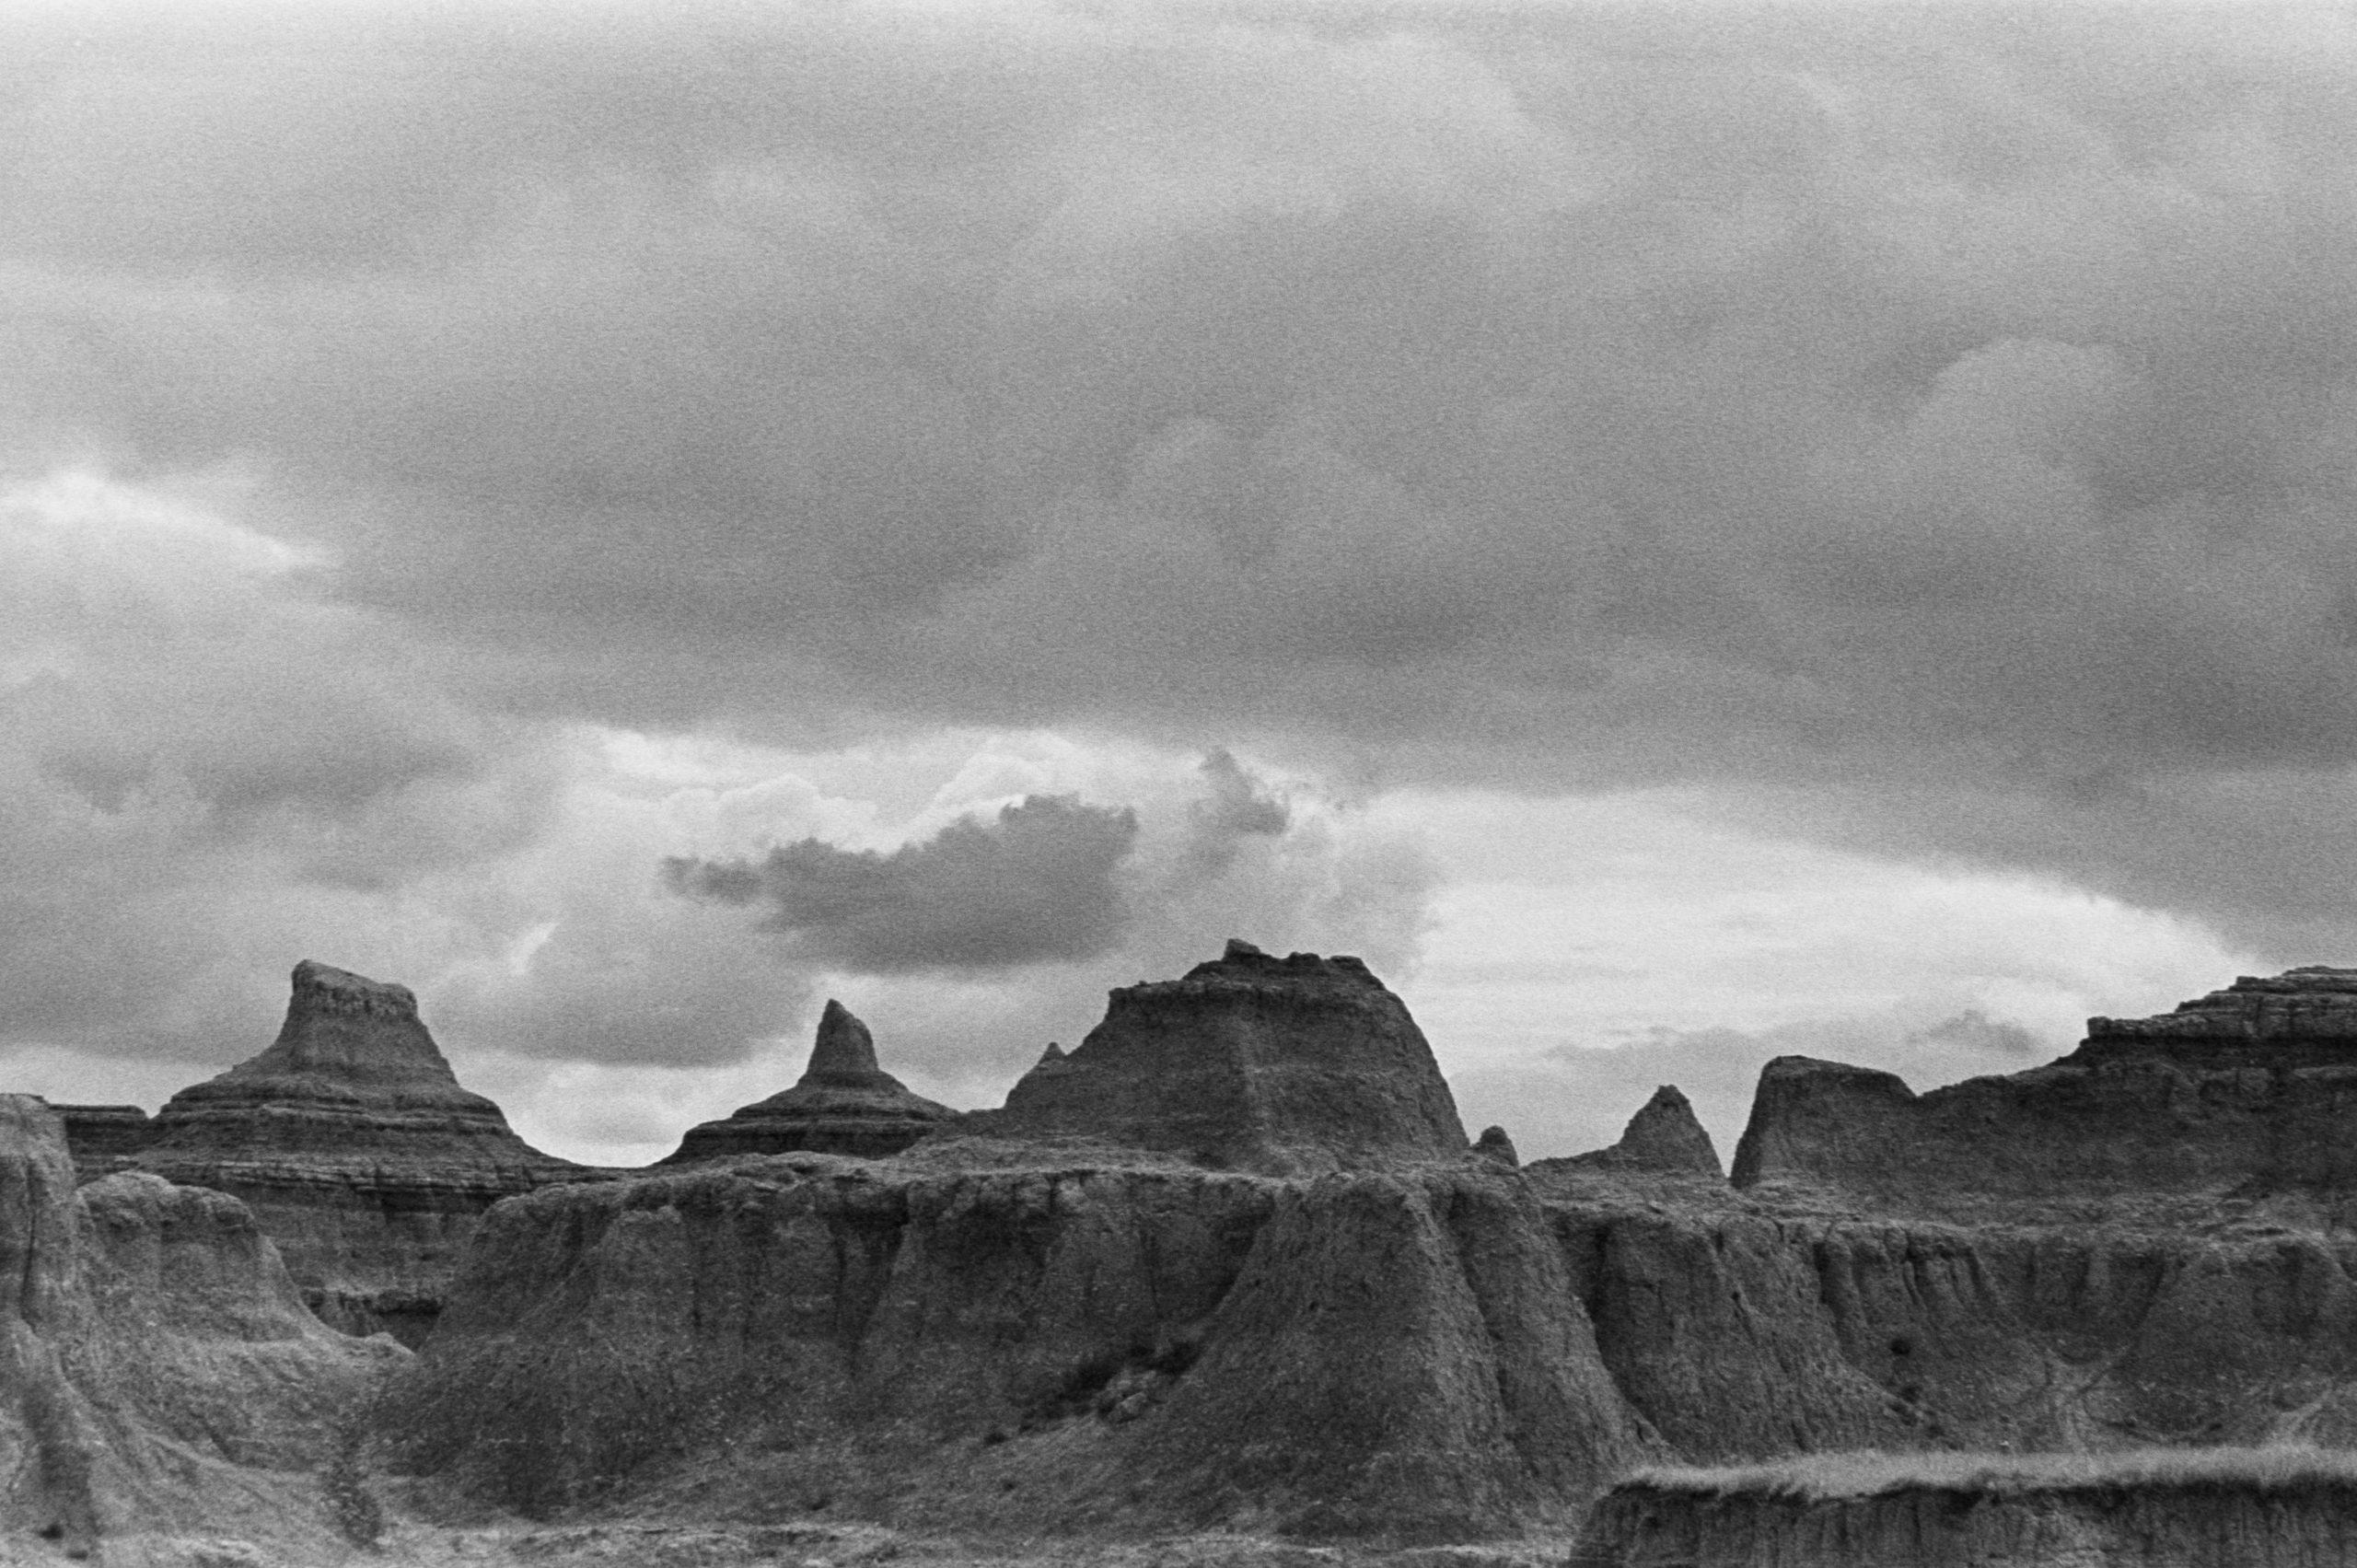 badlands weather clouds black and white trix kodak